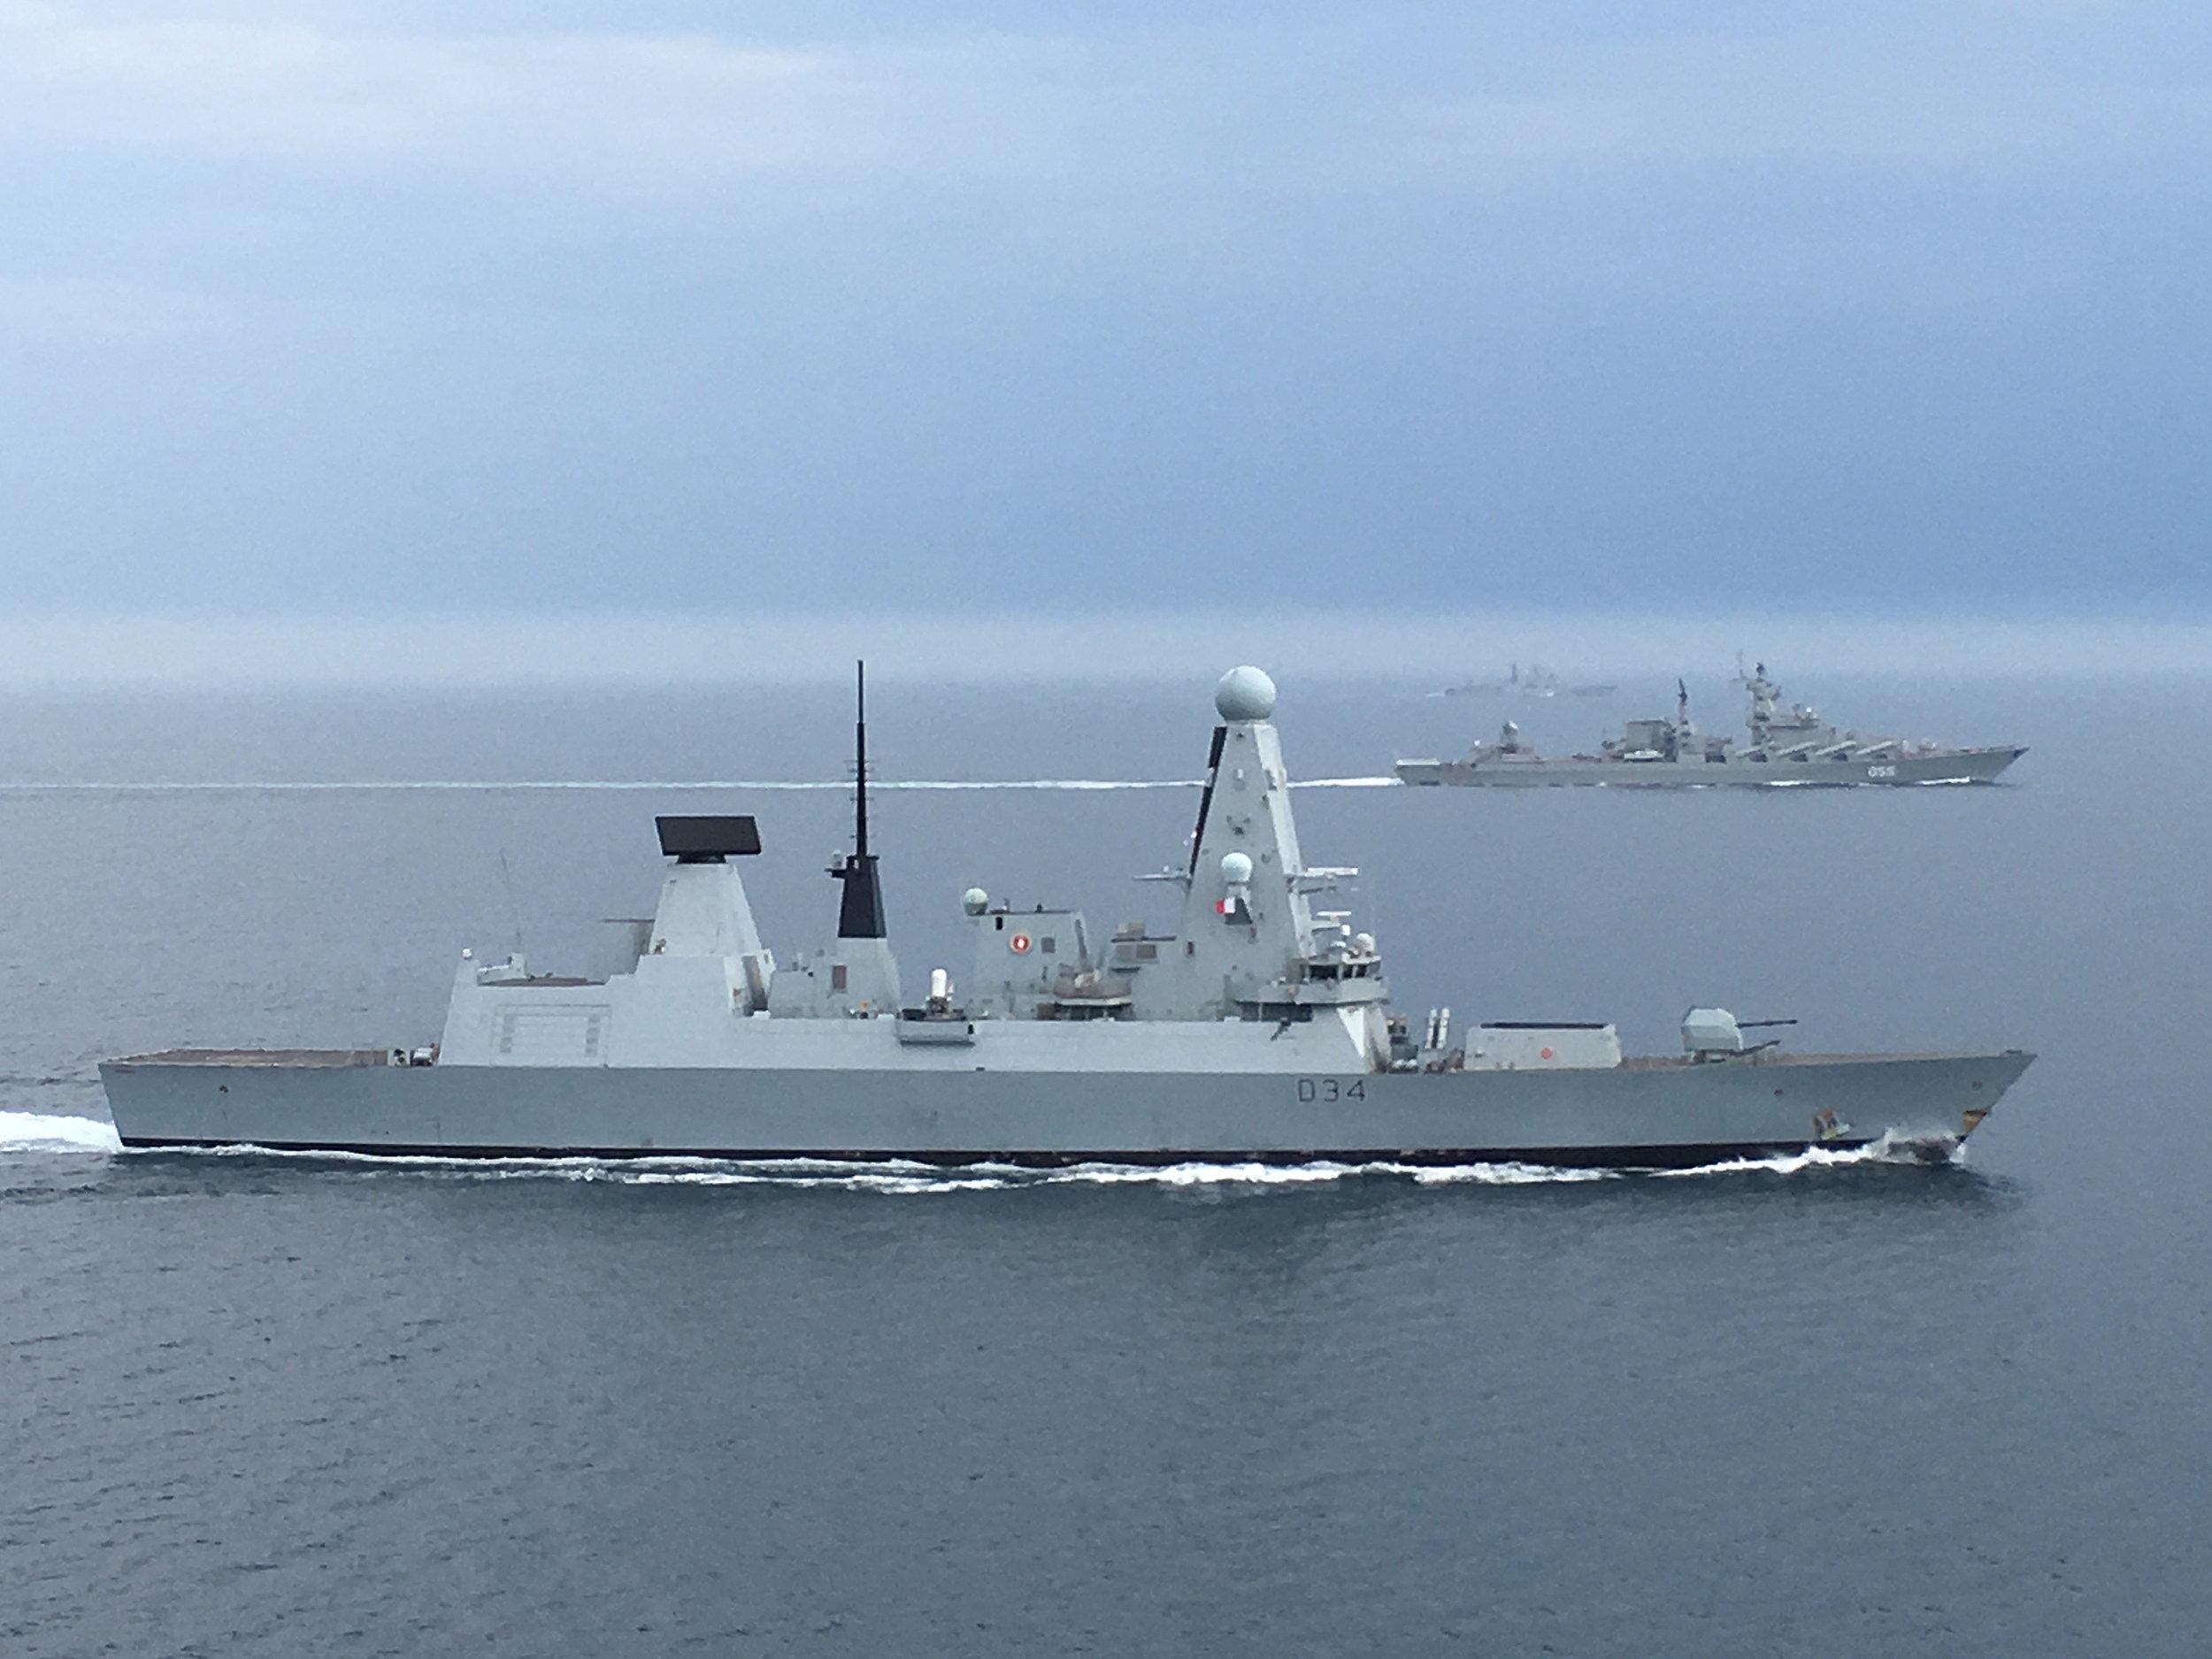 Portsmouth-based HMS Diamond Monitors Russian Warships